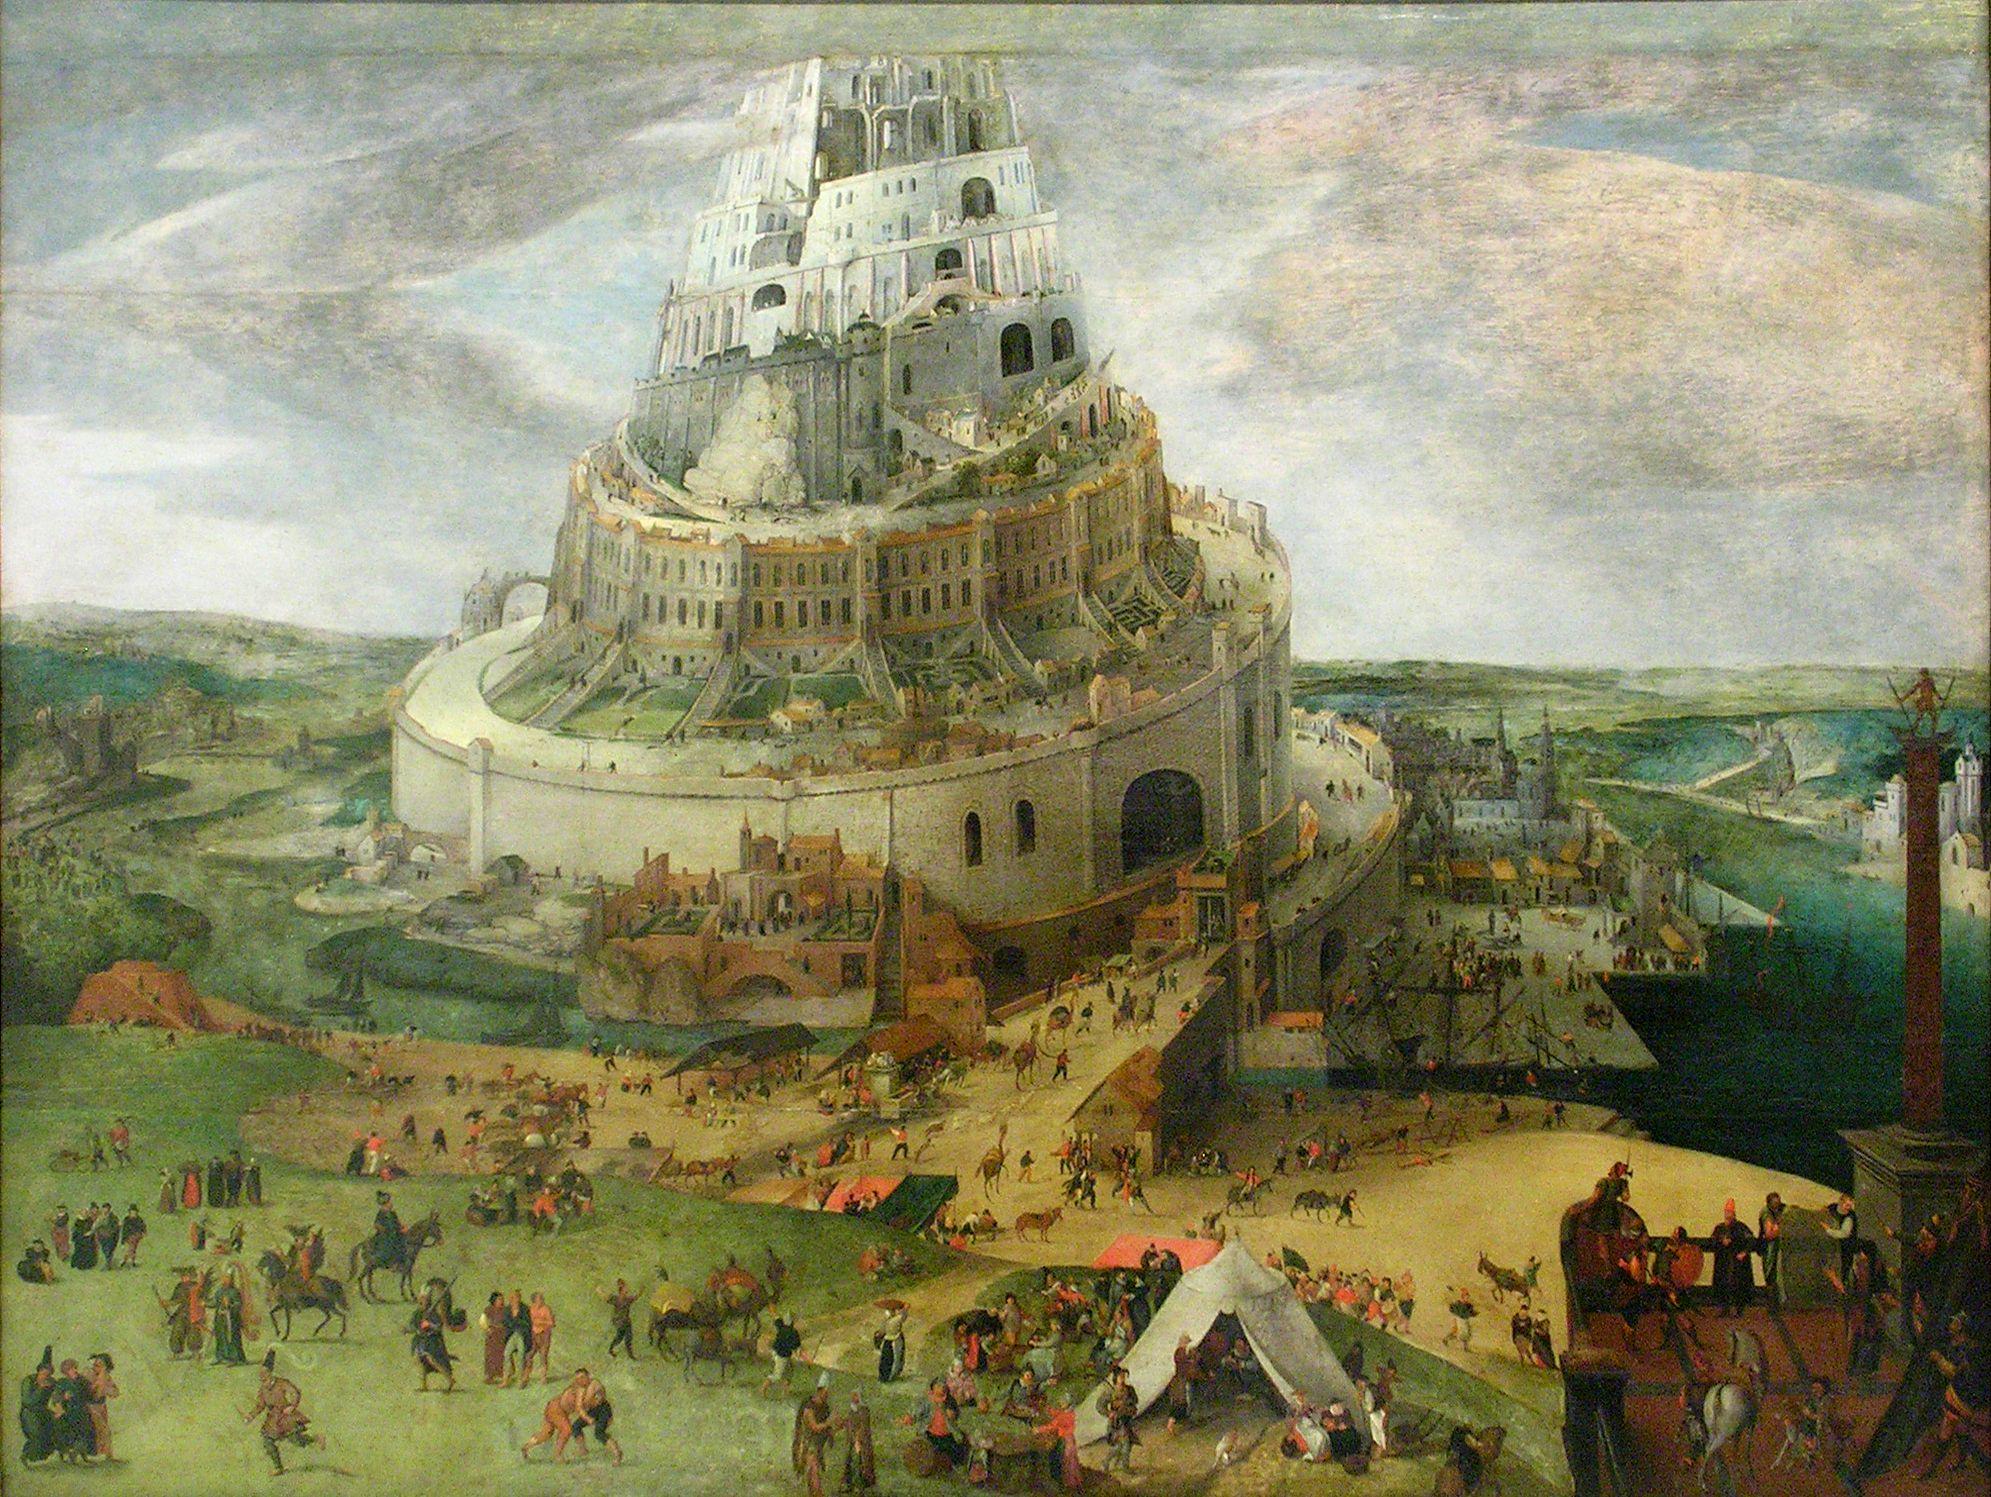 Circle of Jacob Grimmer (1526-1589), Tower of Babel, Museo Nacional de Bellas Artes de Cuba